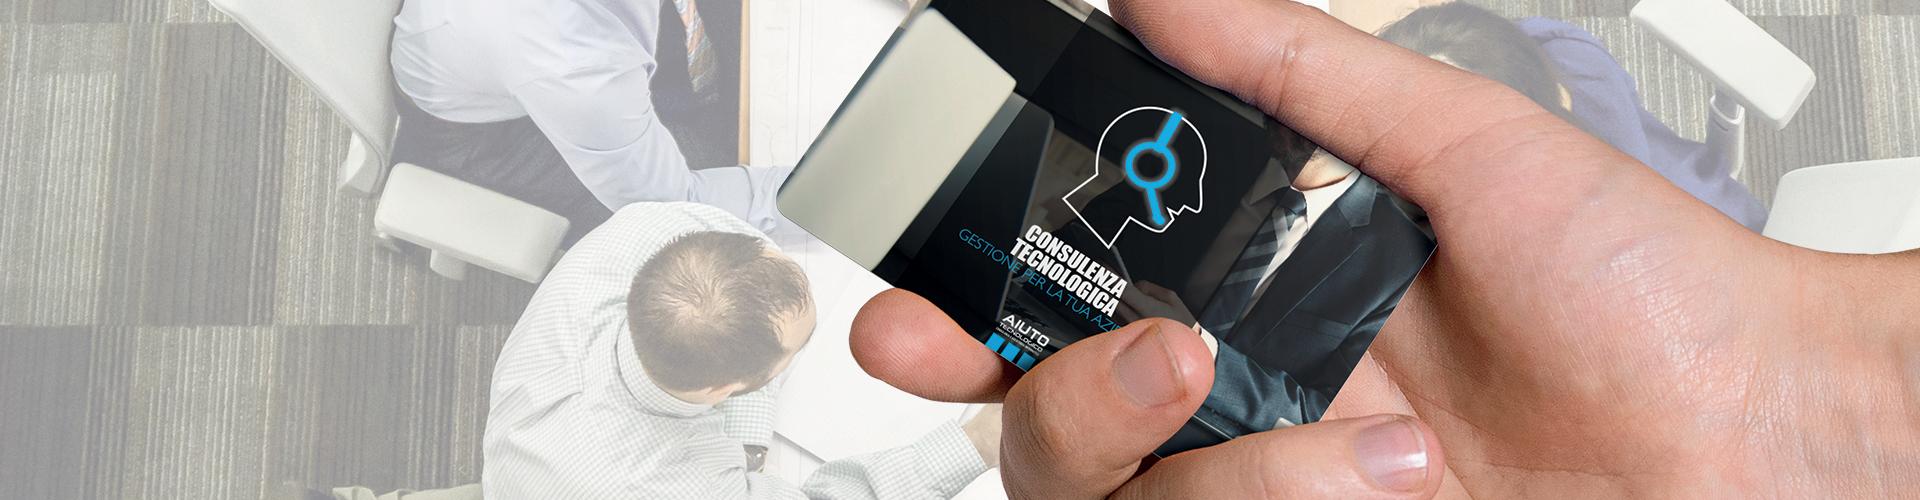 Aiuto Tecnologico: consulenza tecnologica